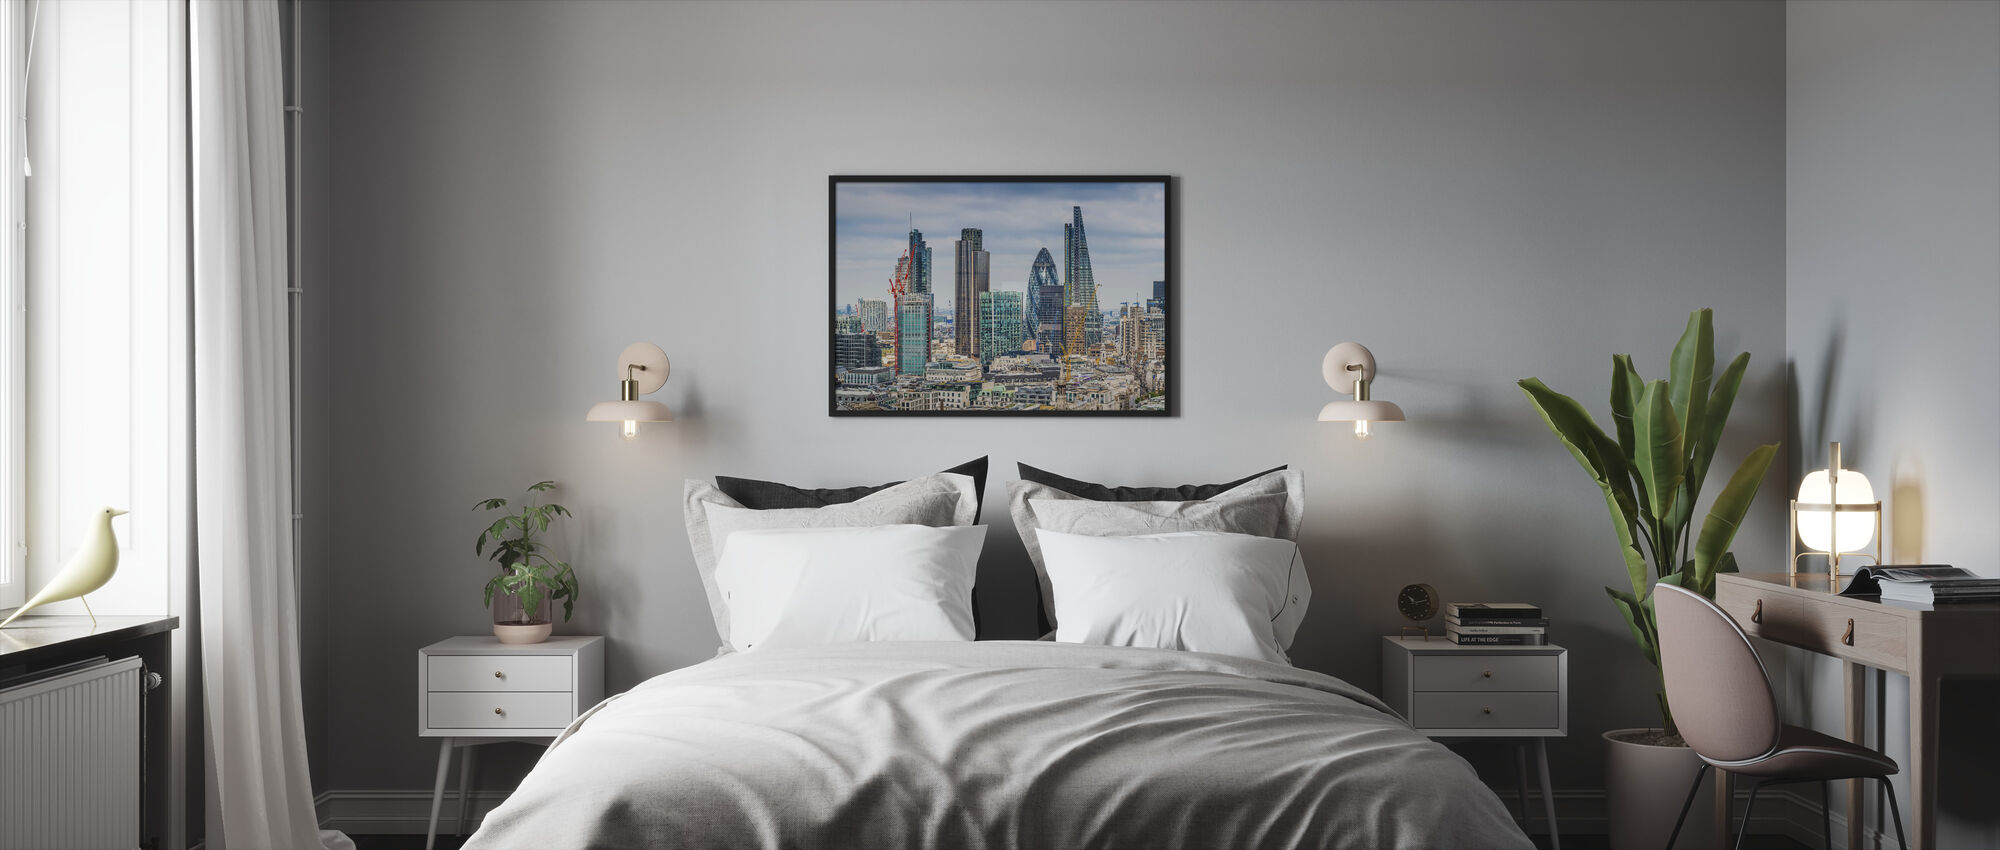 London Skyscrapers - Framed print - Bedroom